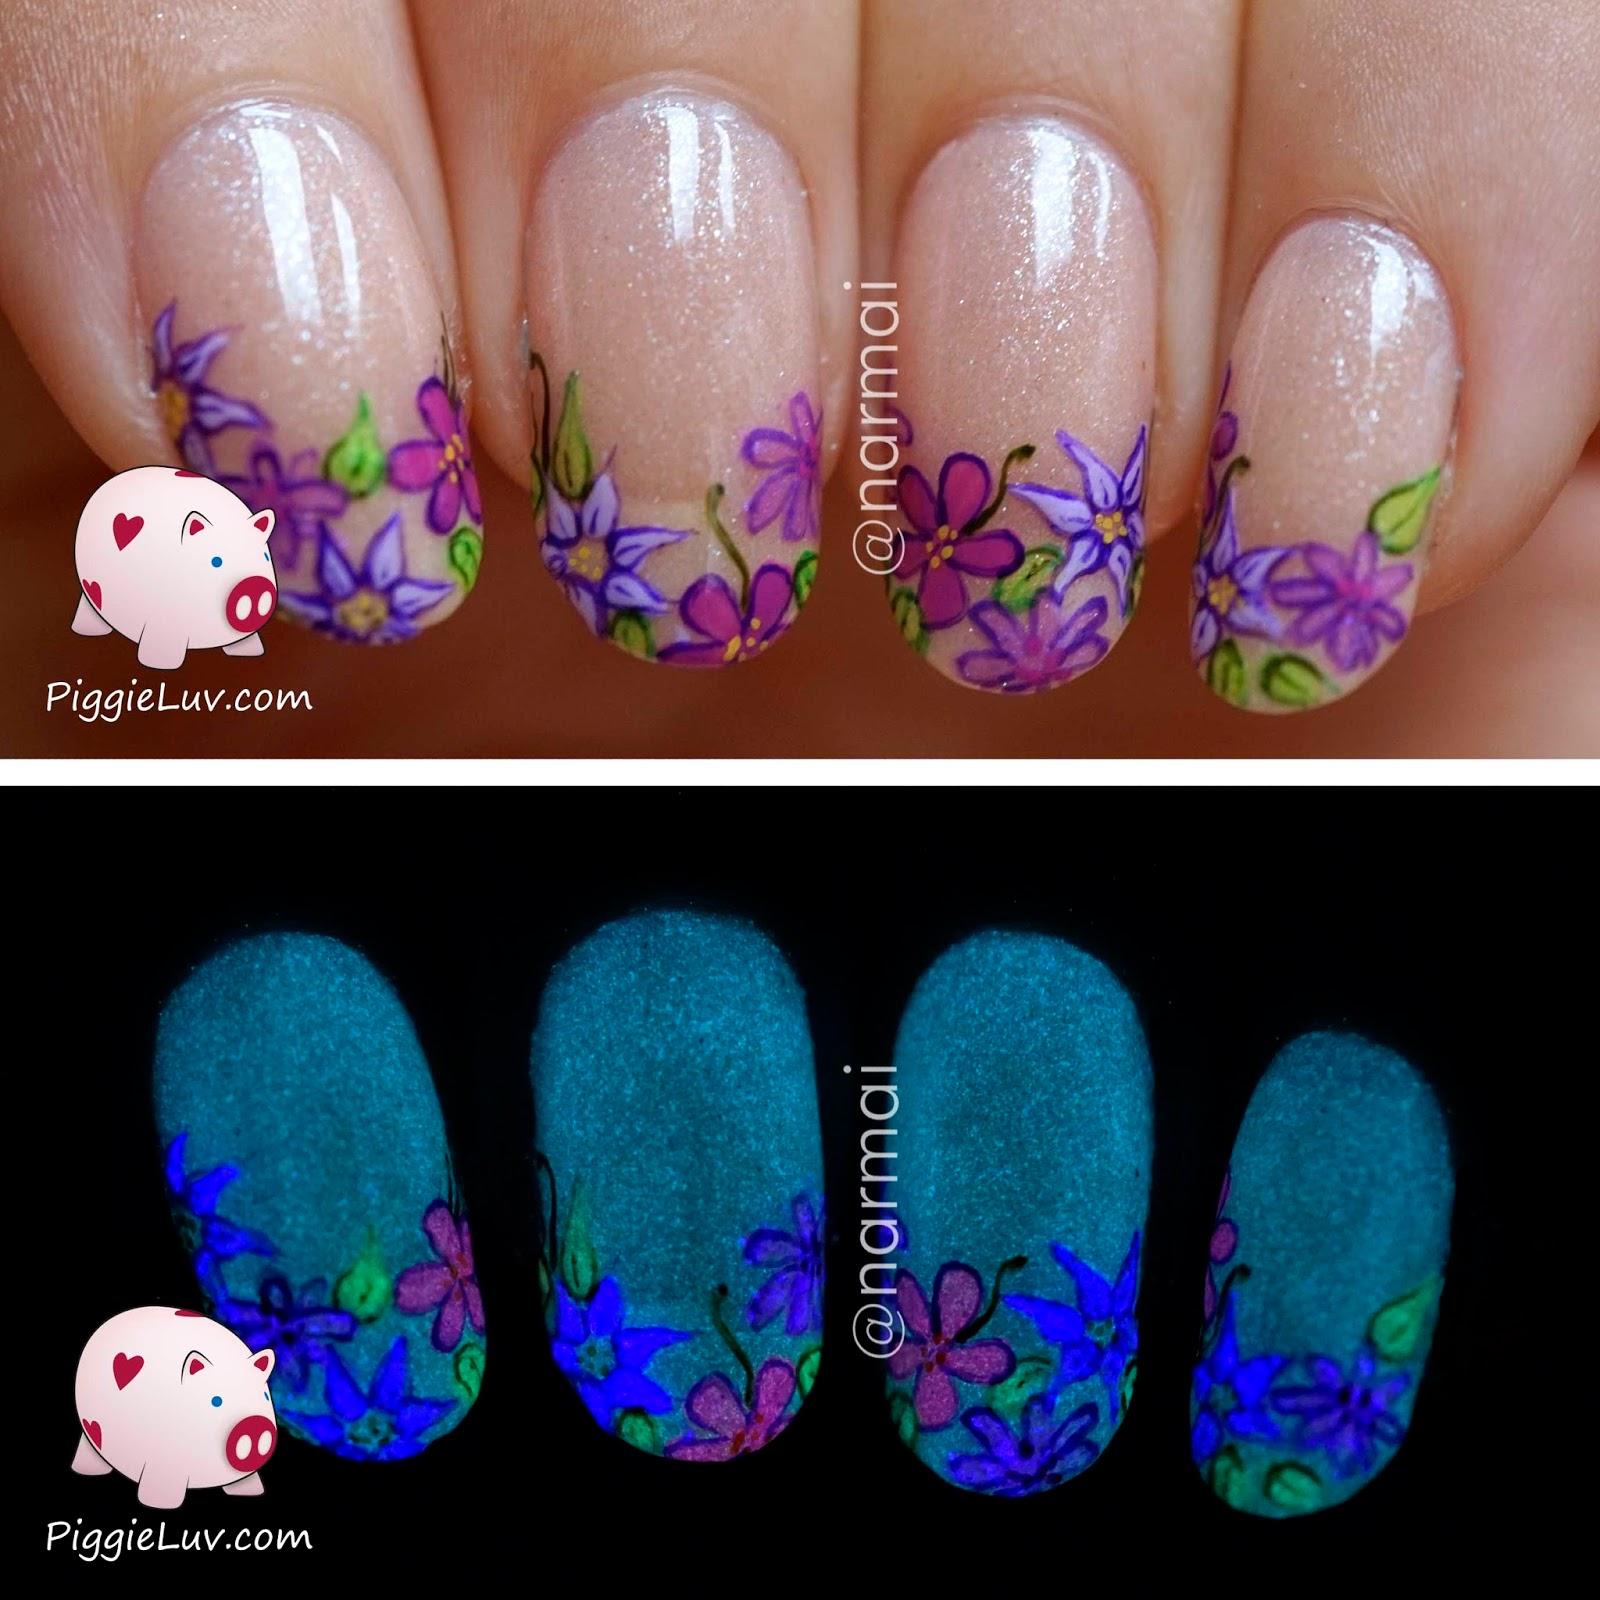 Fotos De Flores Azules Y Violetas - Flores azules y moradas Plantas facilisimo com